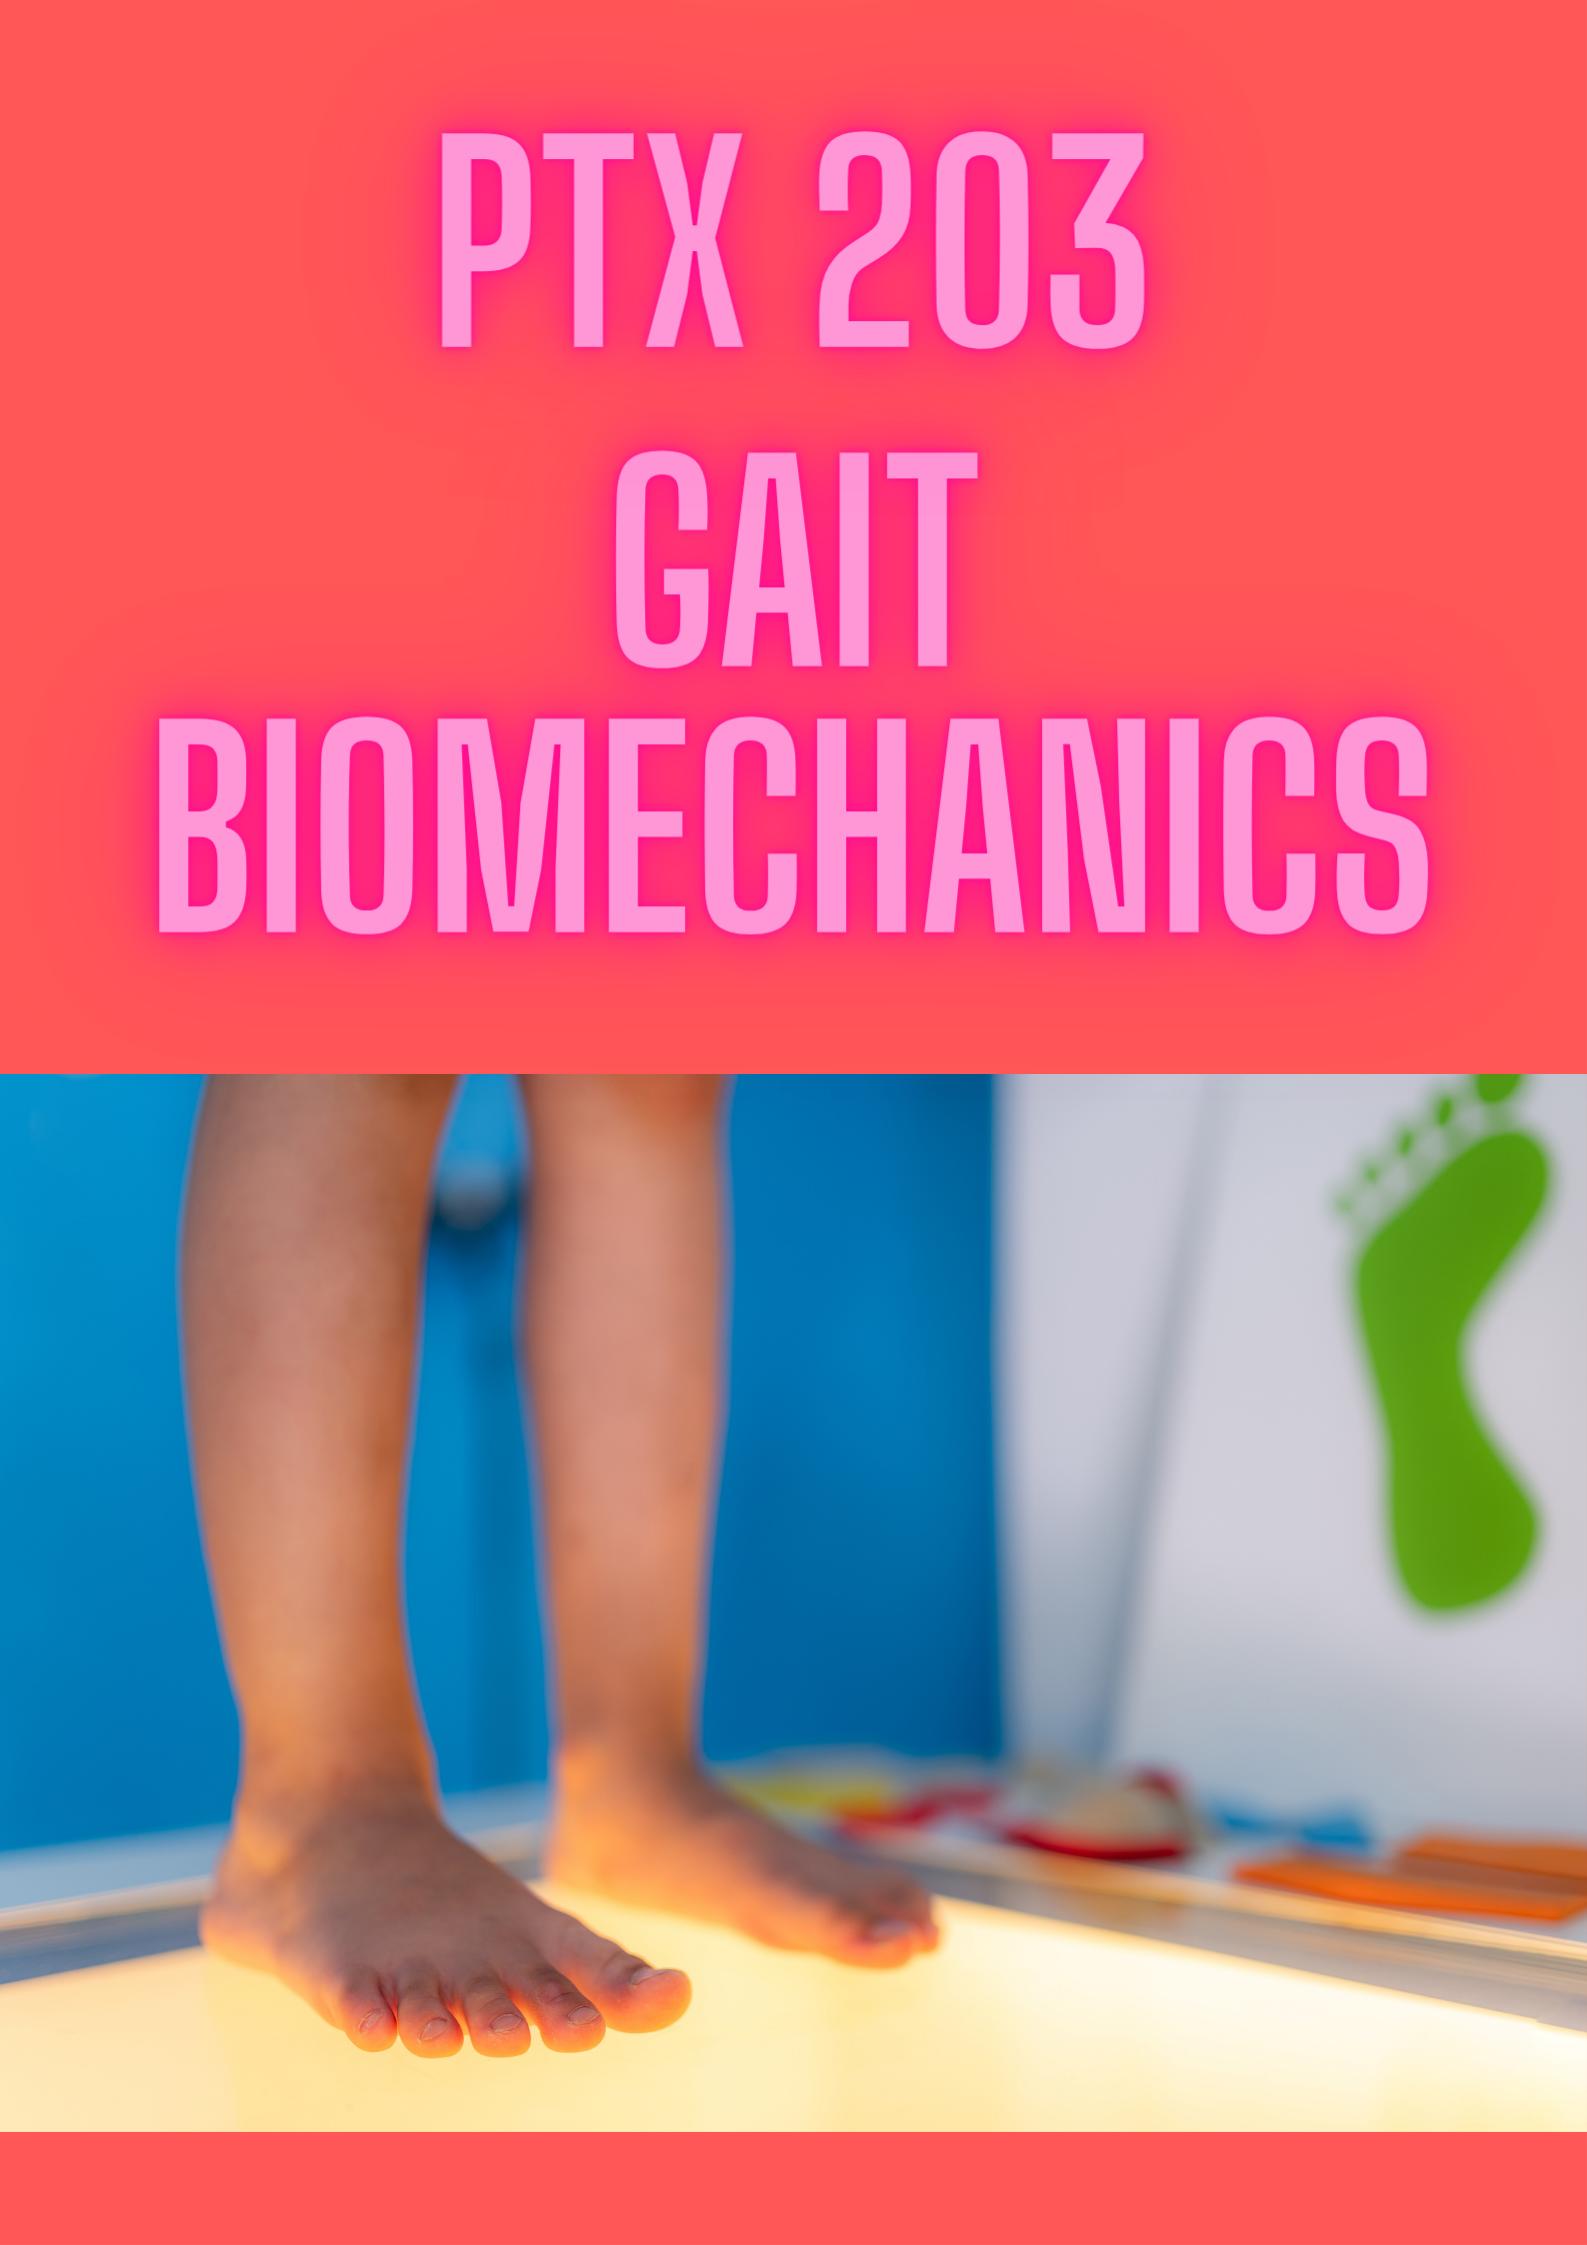 PTX 203 Gait Biomechanics